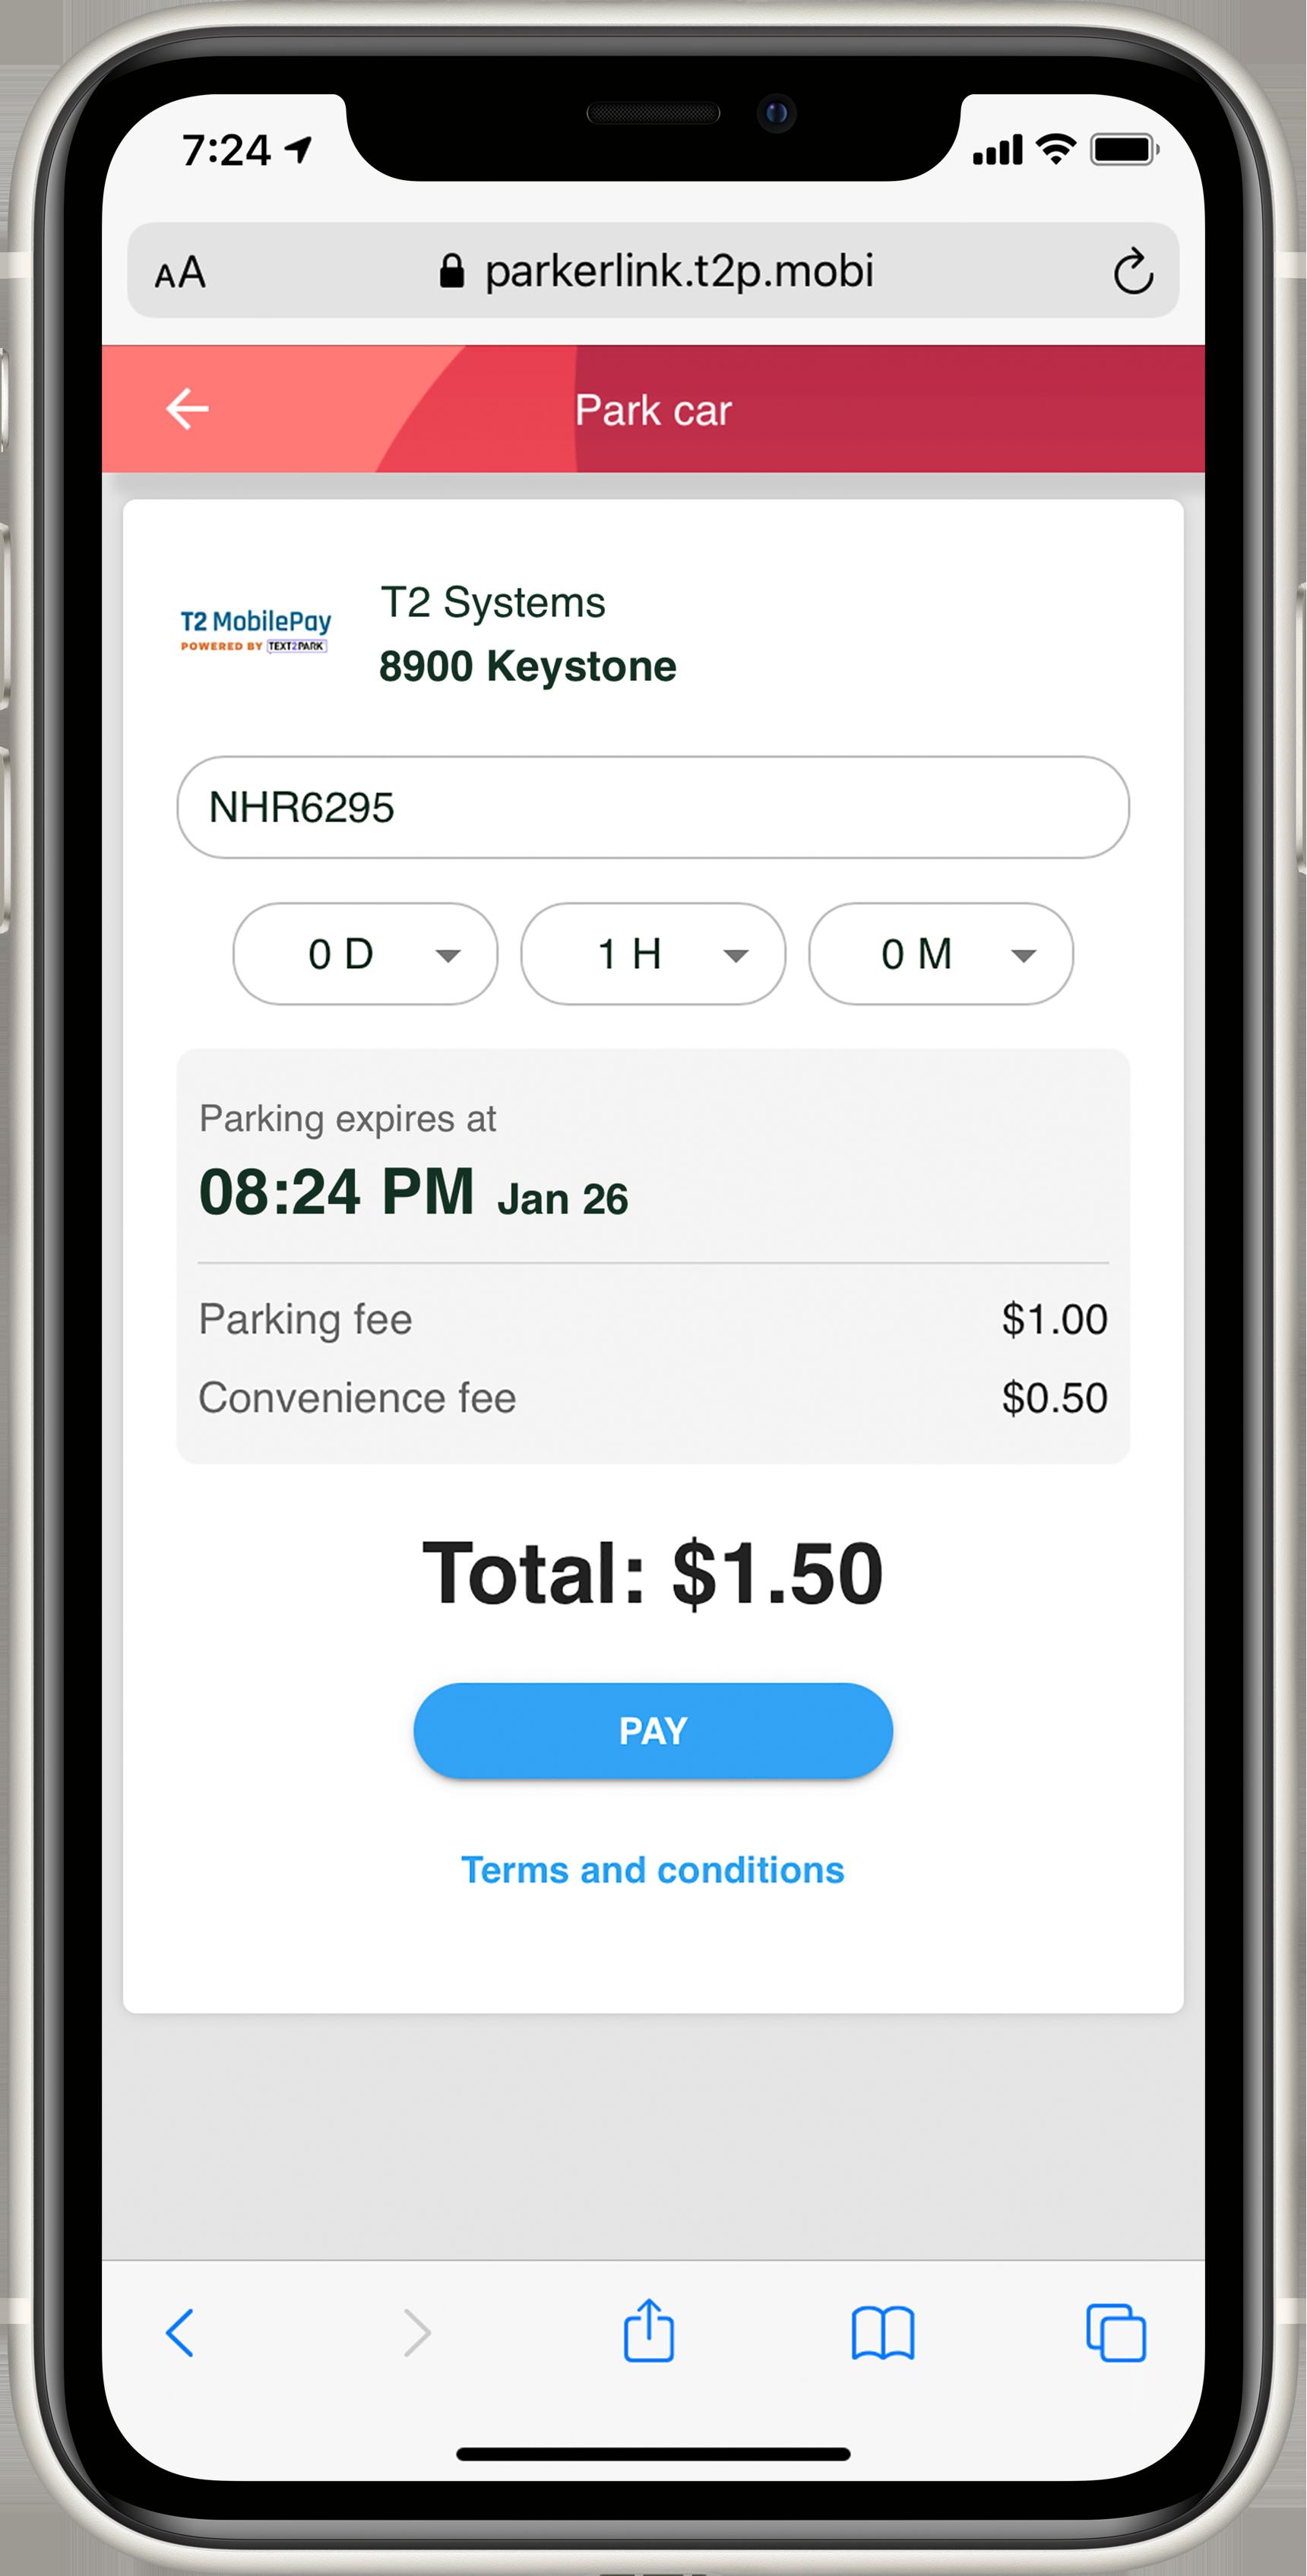 T2 MobilePay parking payment platform